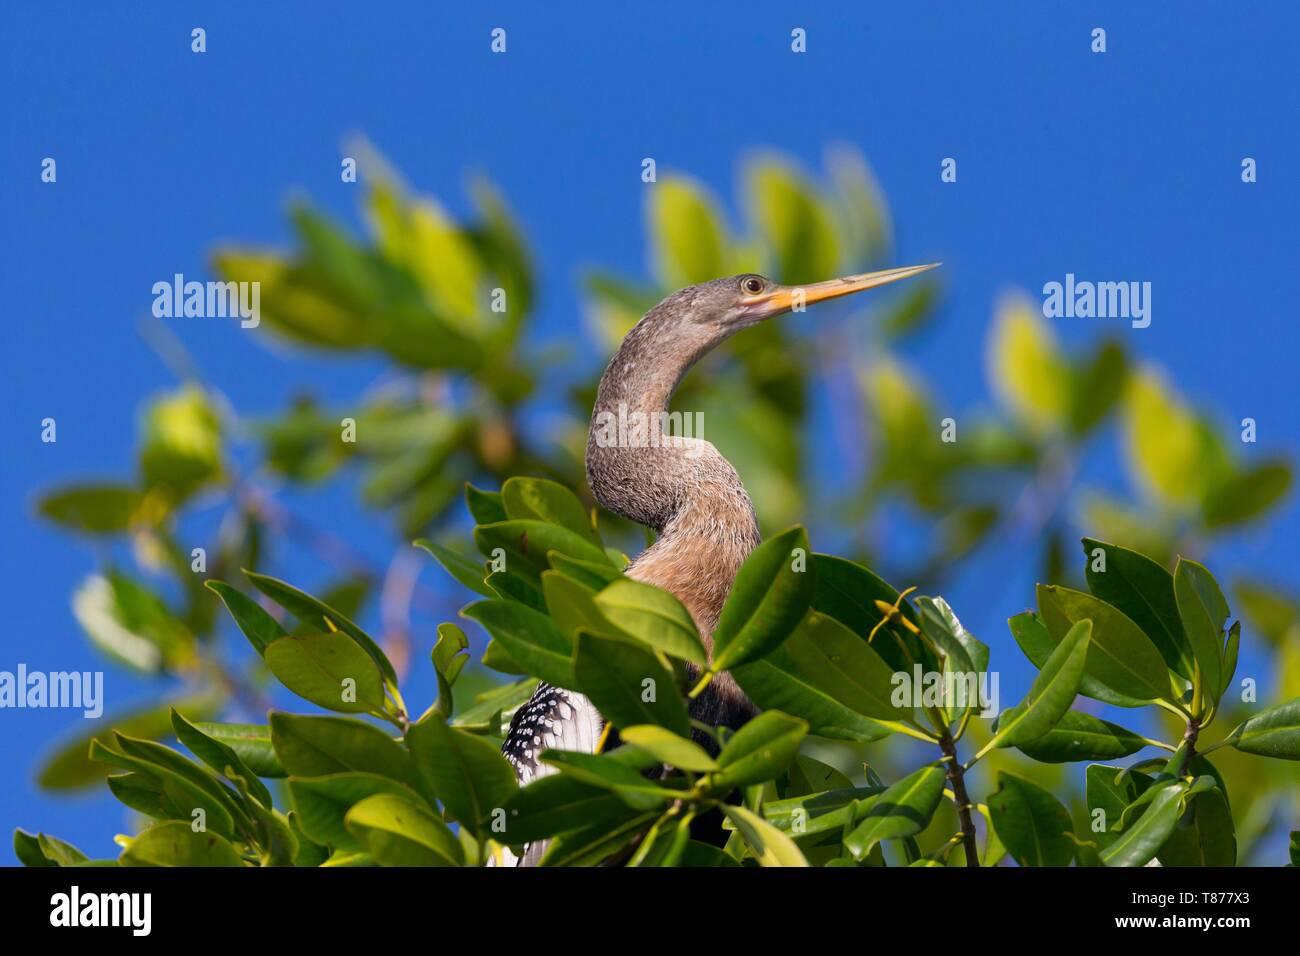 Cuba Province of Cienfuegos Cienfuegos, the Reserve Laguna de Guanaroca, snake bird, Anhinga (Anhinga anhinga) - Stock Image